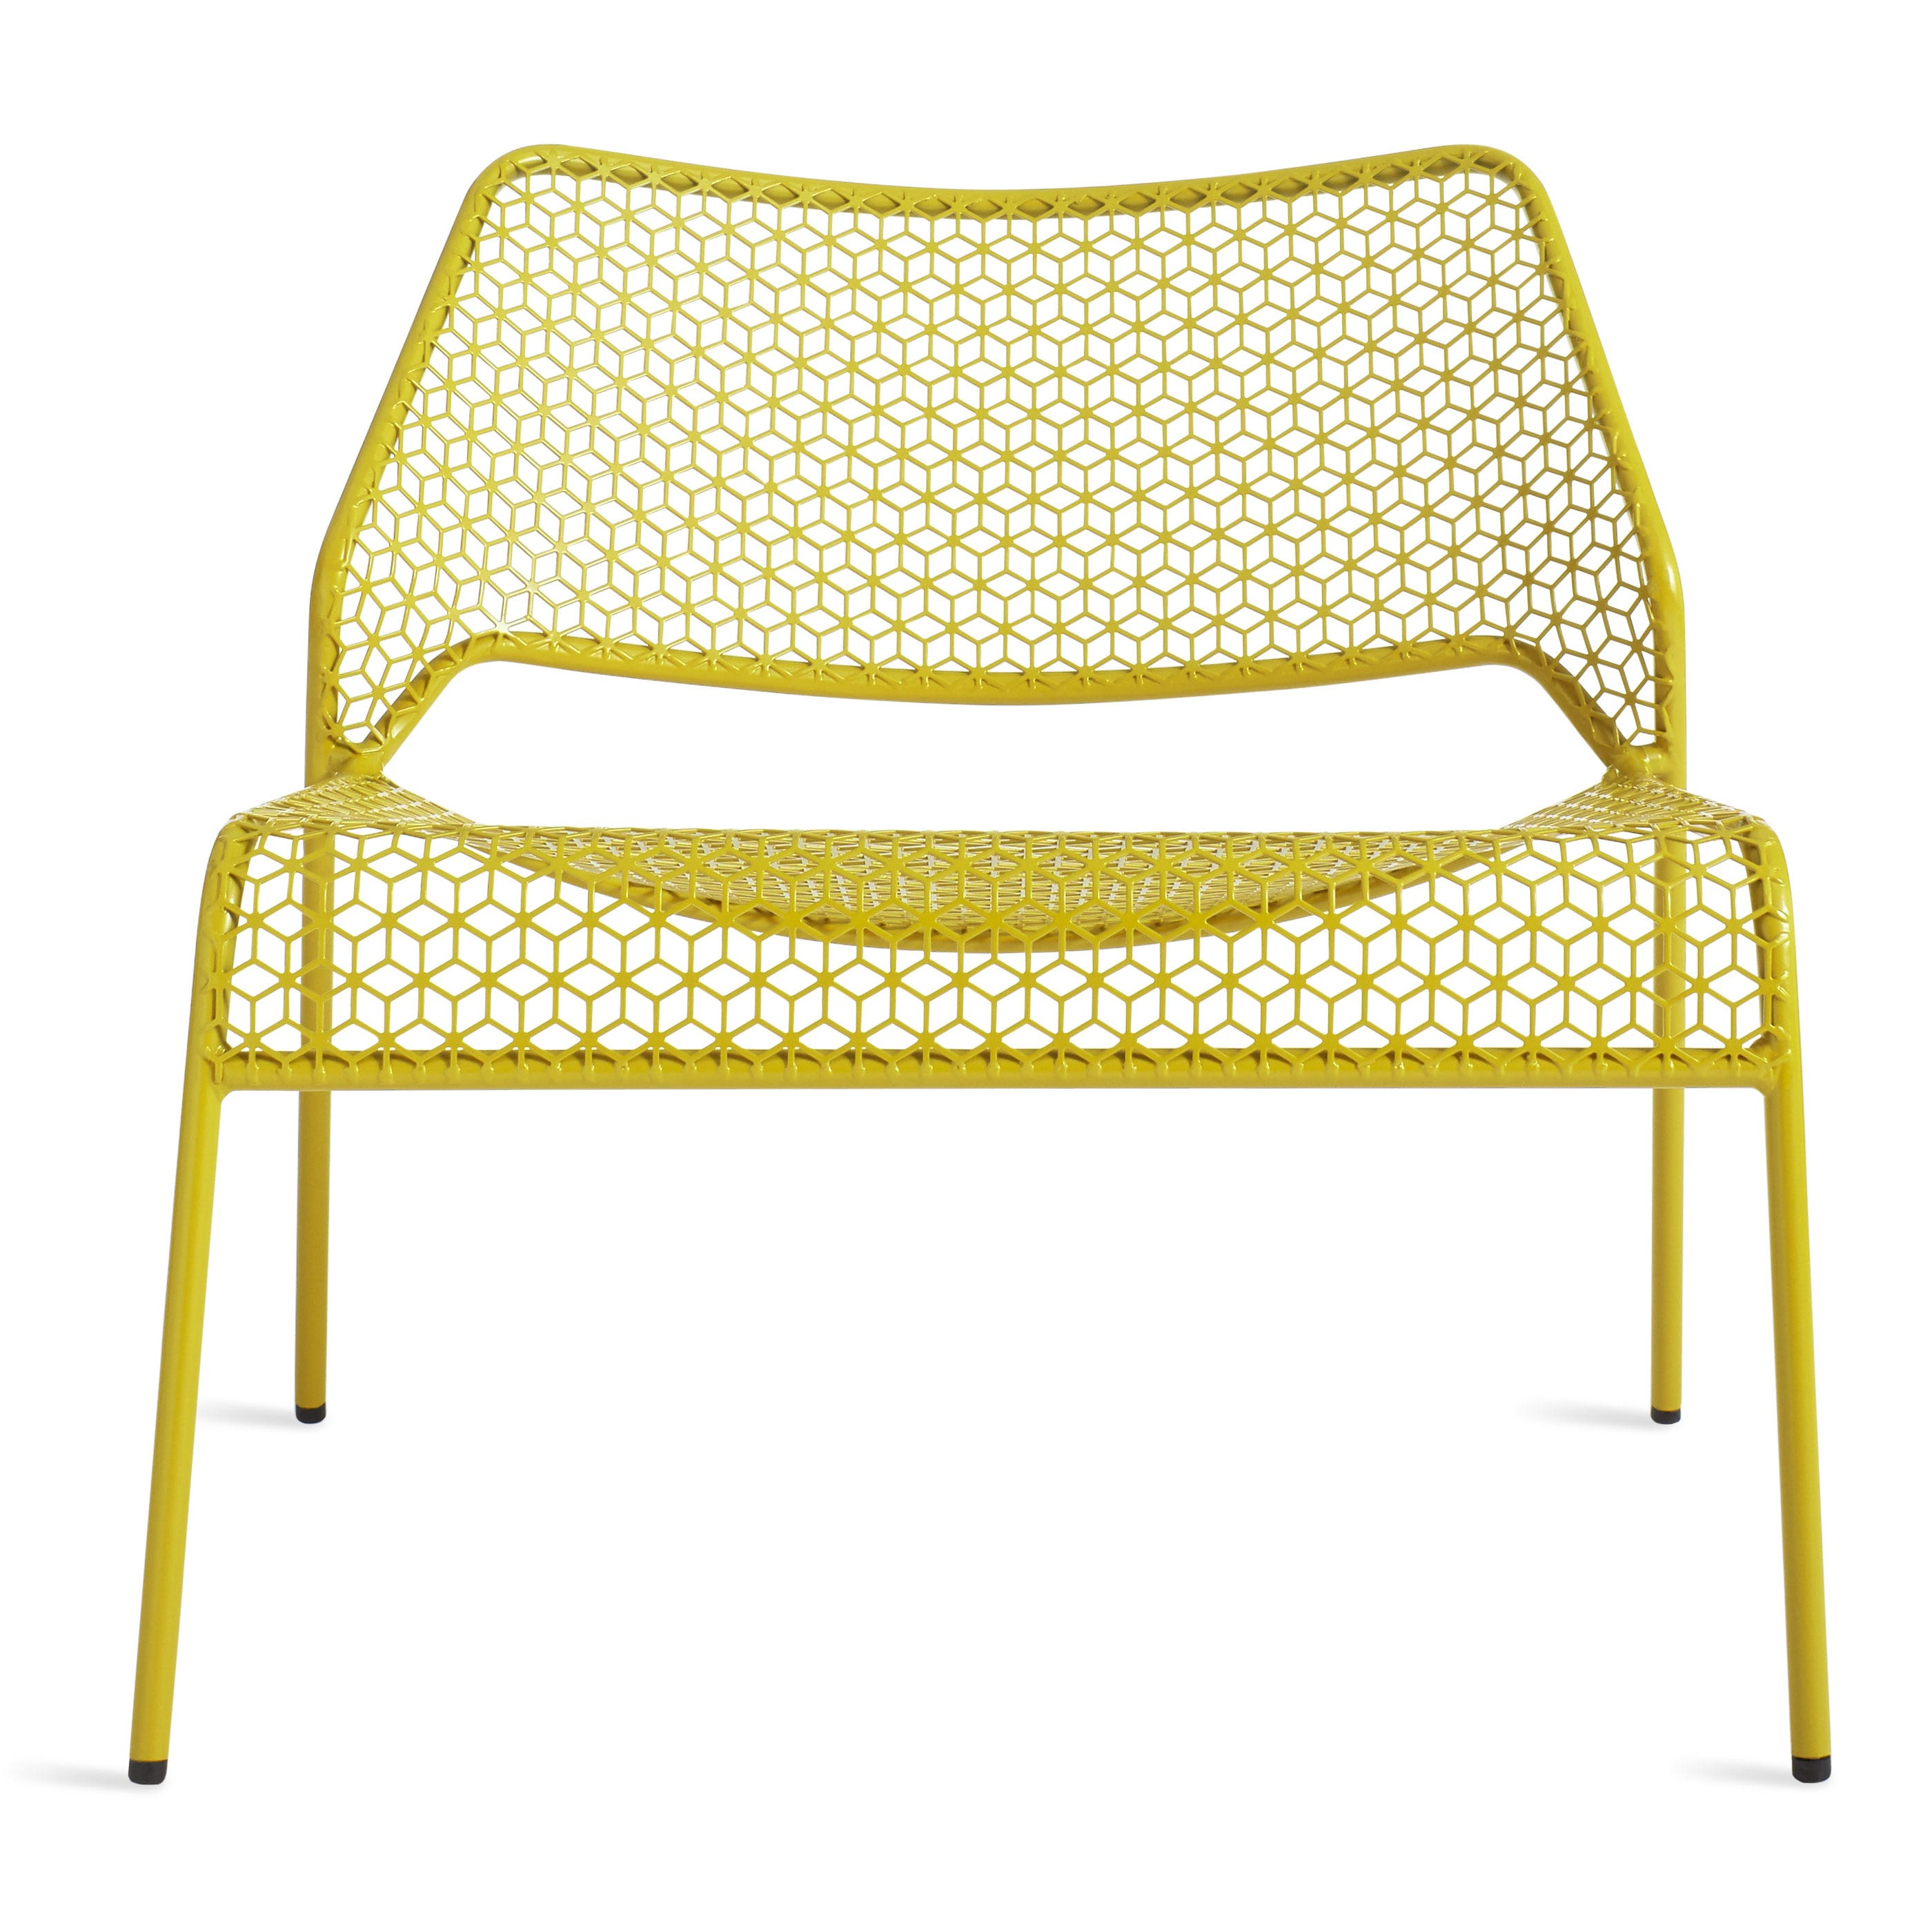 Previous image Hot Mesh Modern Lounge Chair  Hot Mesh Lounge Chair   Metal Lounge Chair   Blu Dot. Modern Yellow Lounge Chair. Home Design Ideas